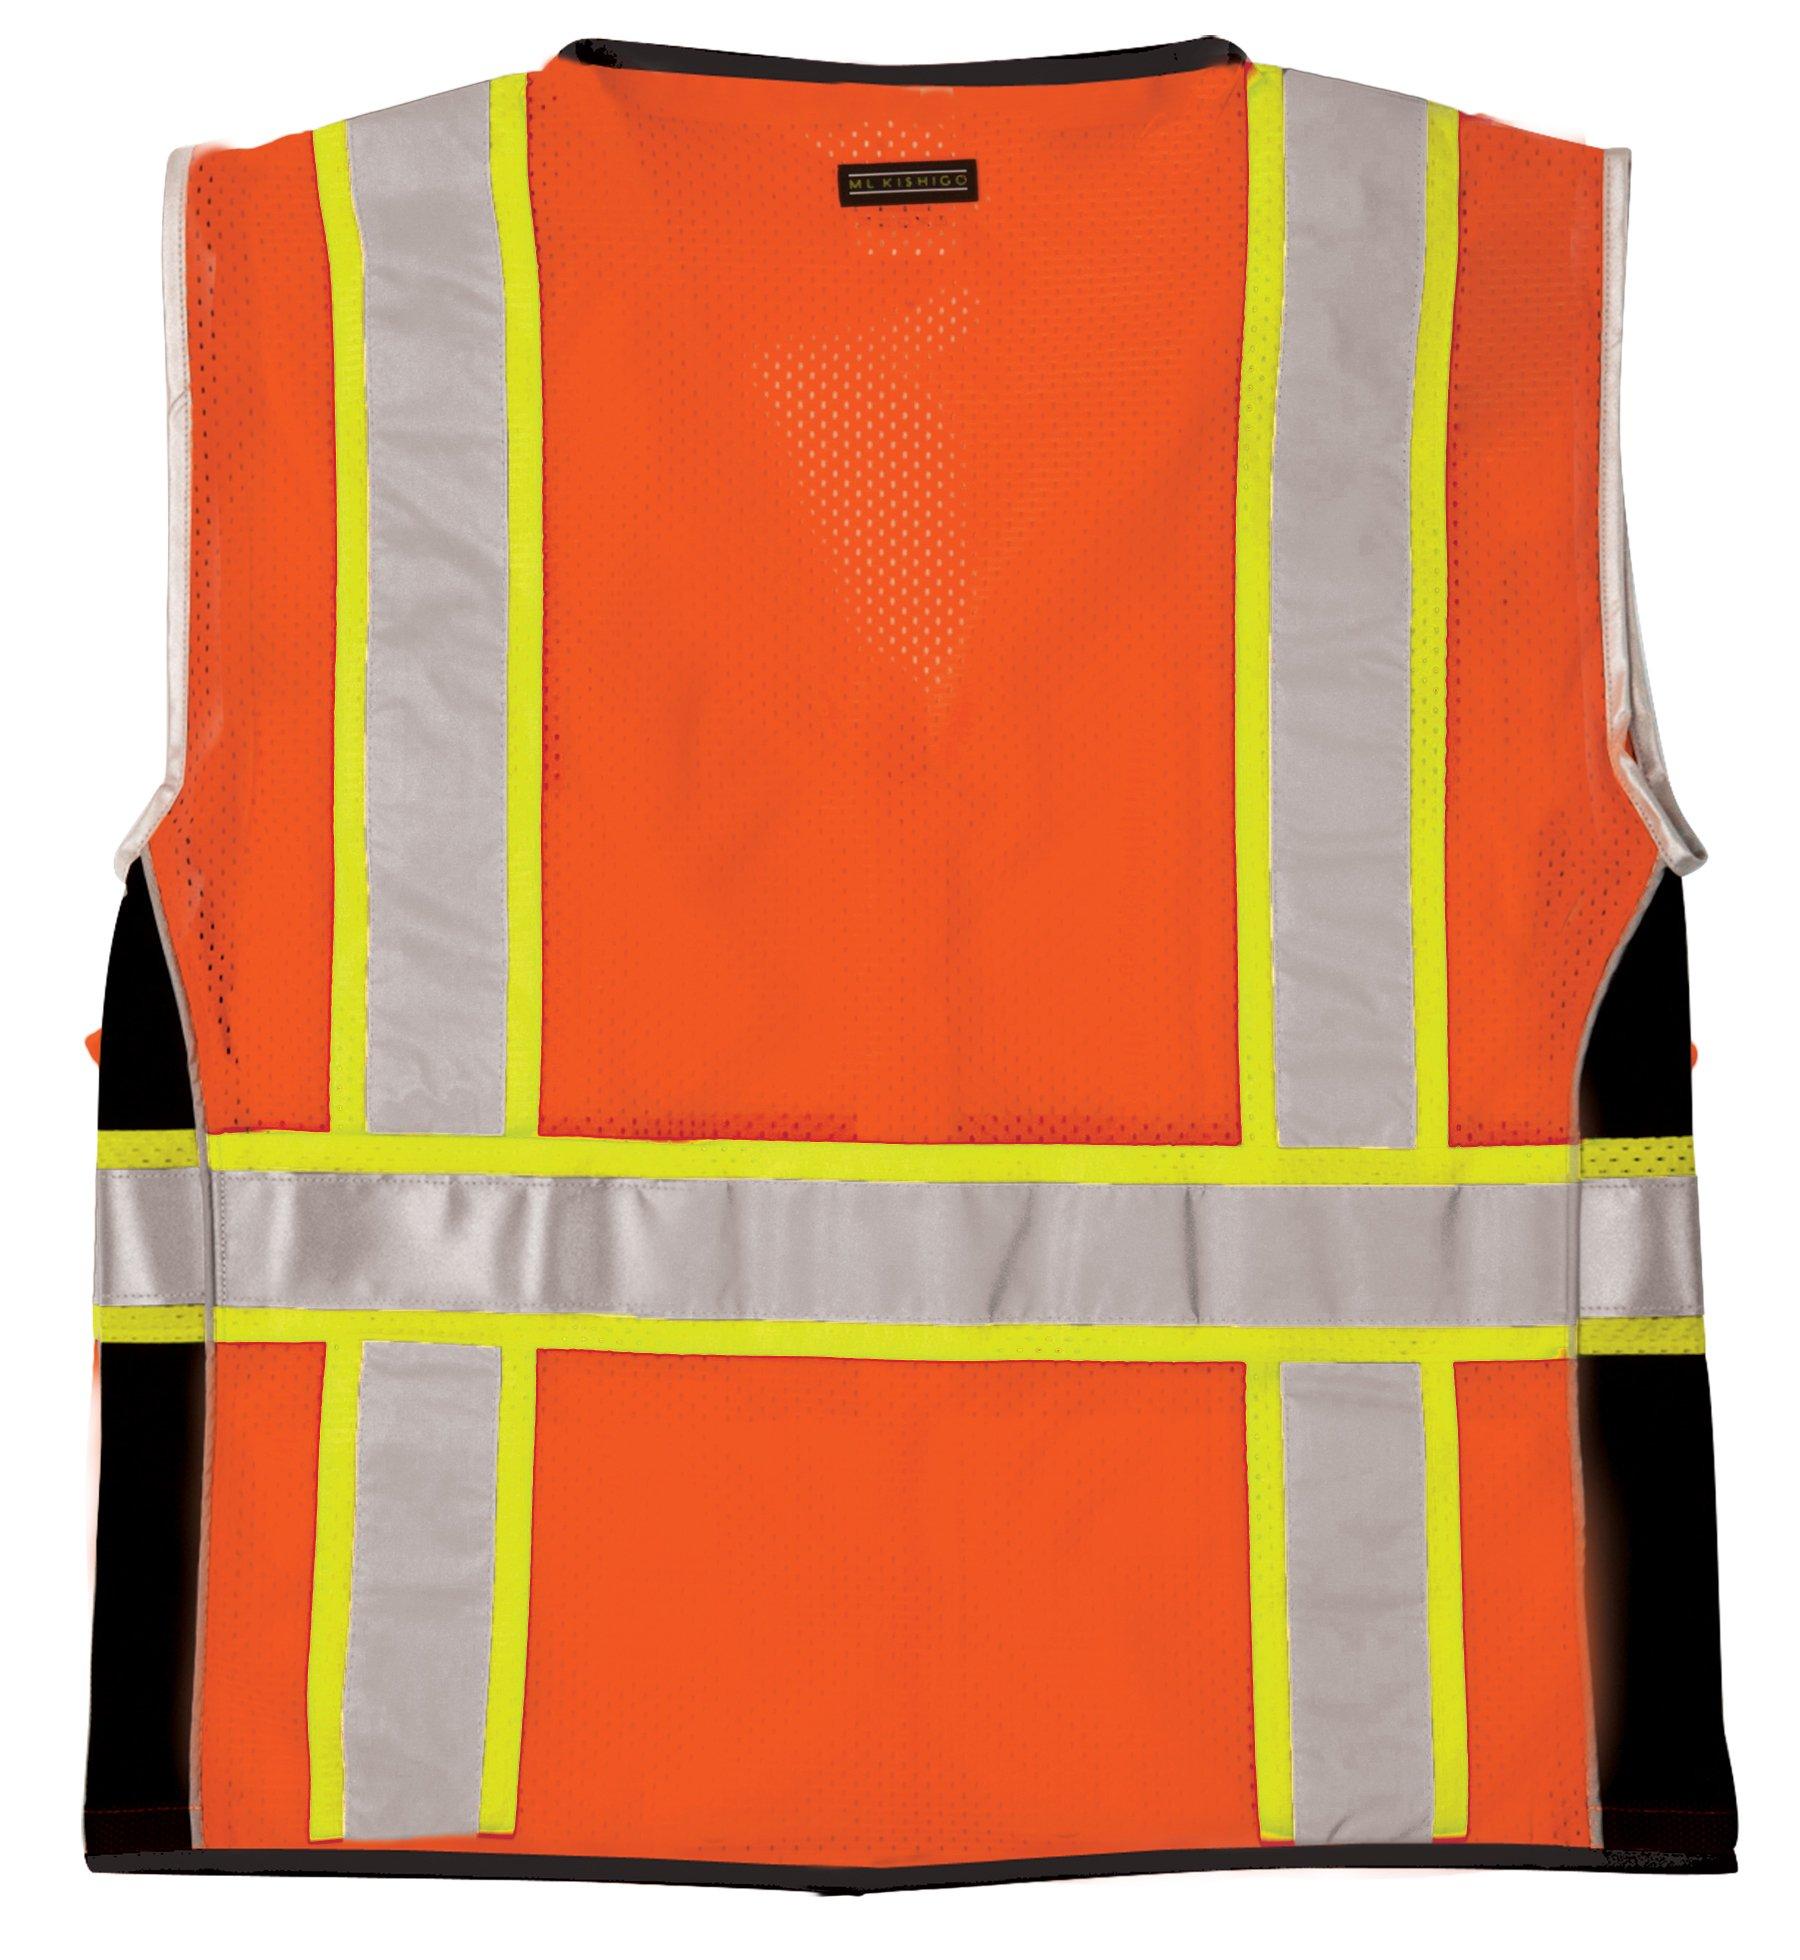 ML Kishigo 1514 Ultra-Cool Polyester Black Series Heavy Duty Vest, Large, Orange by ML Kishigo (Image #2)